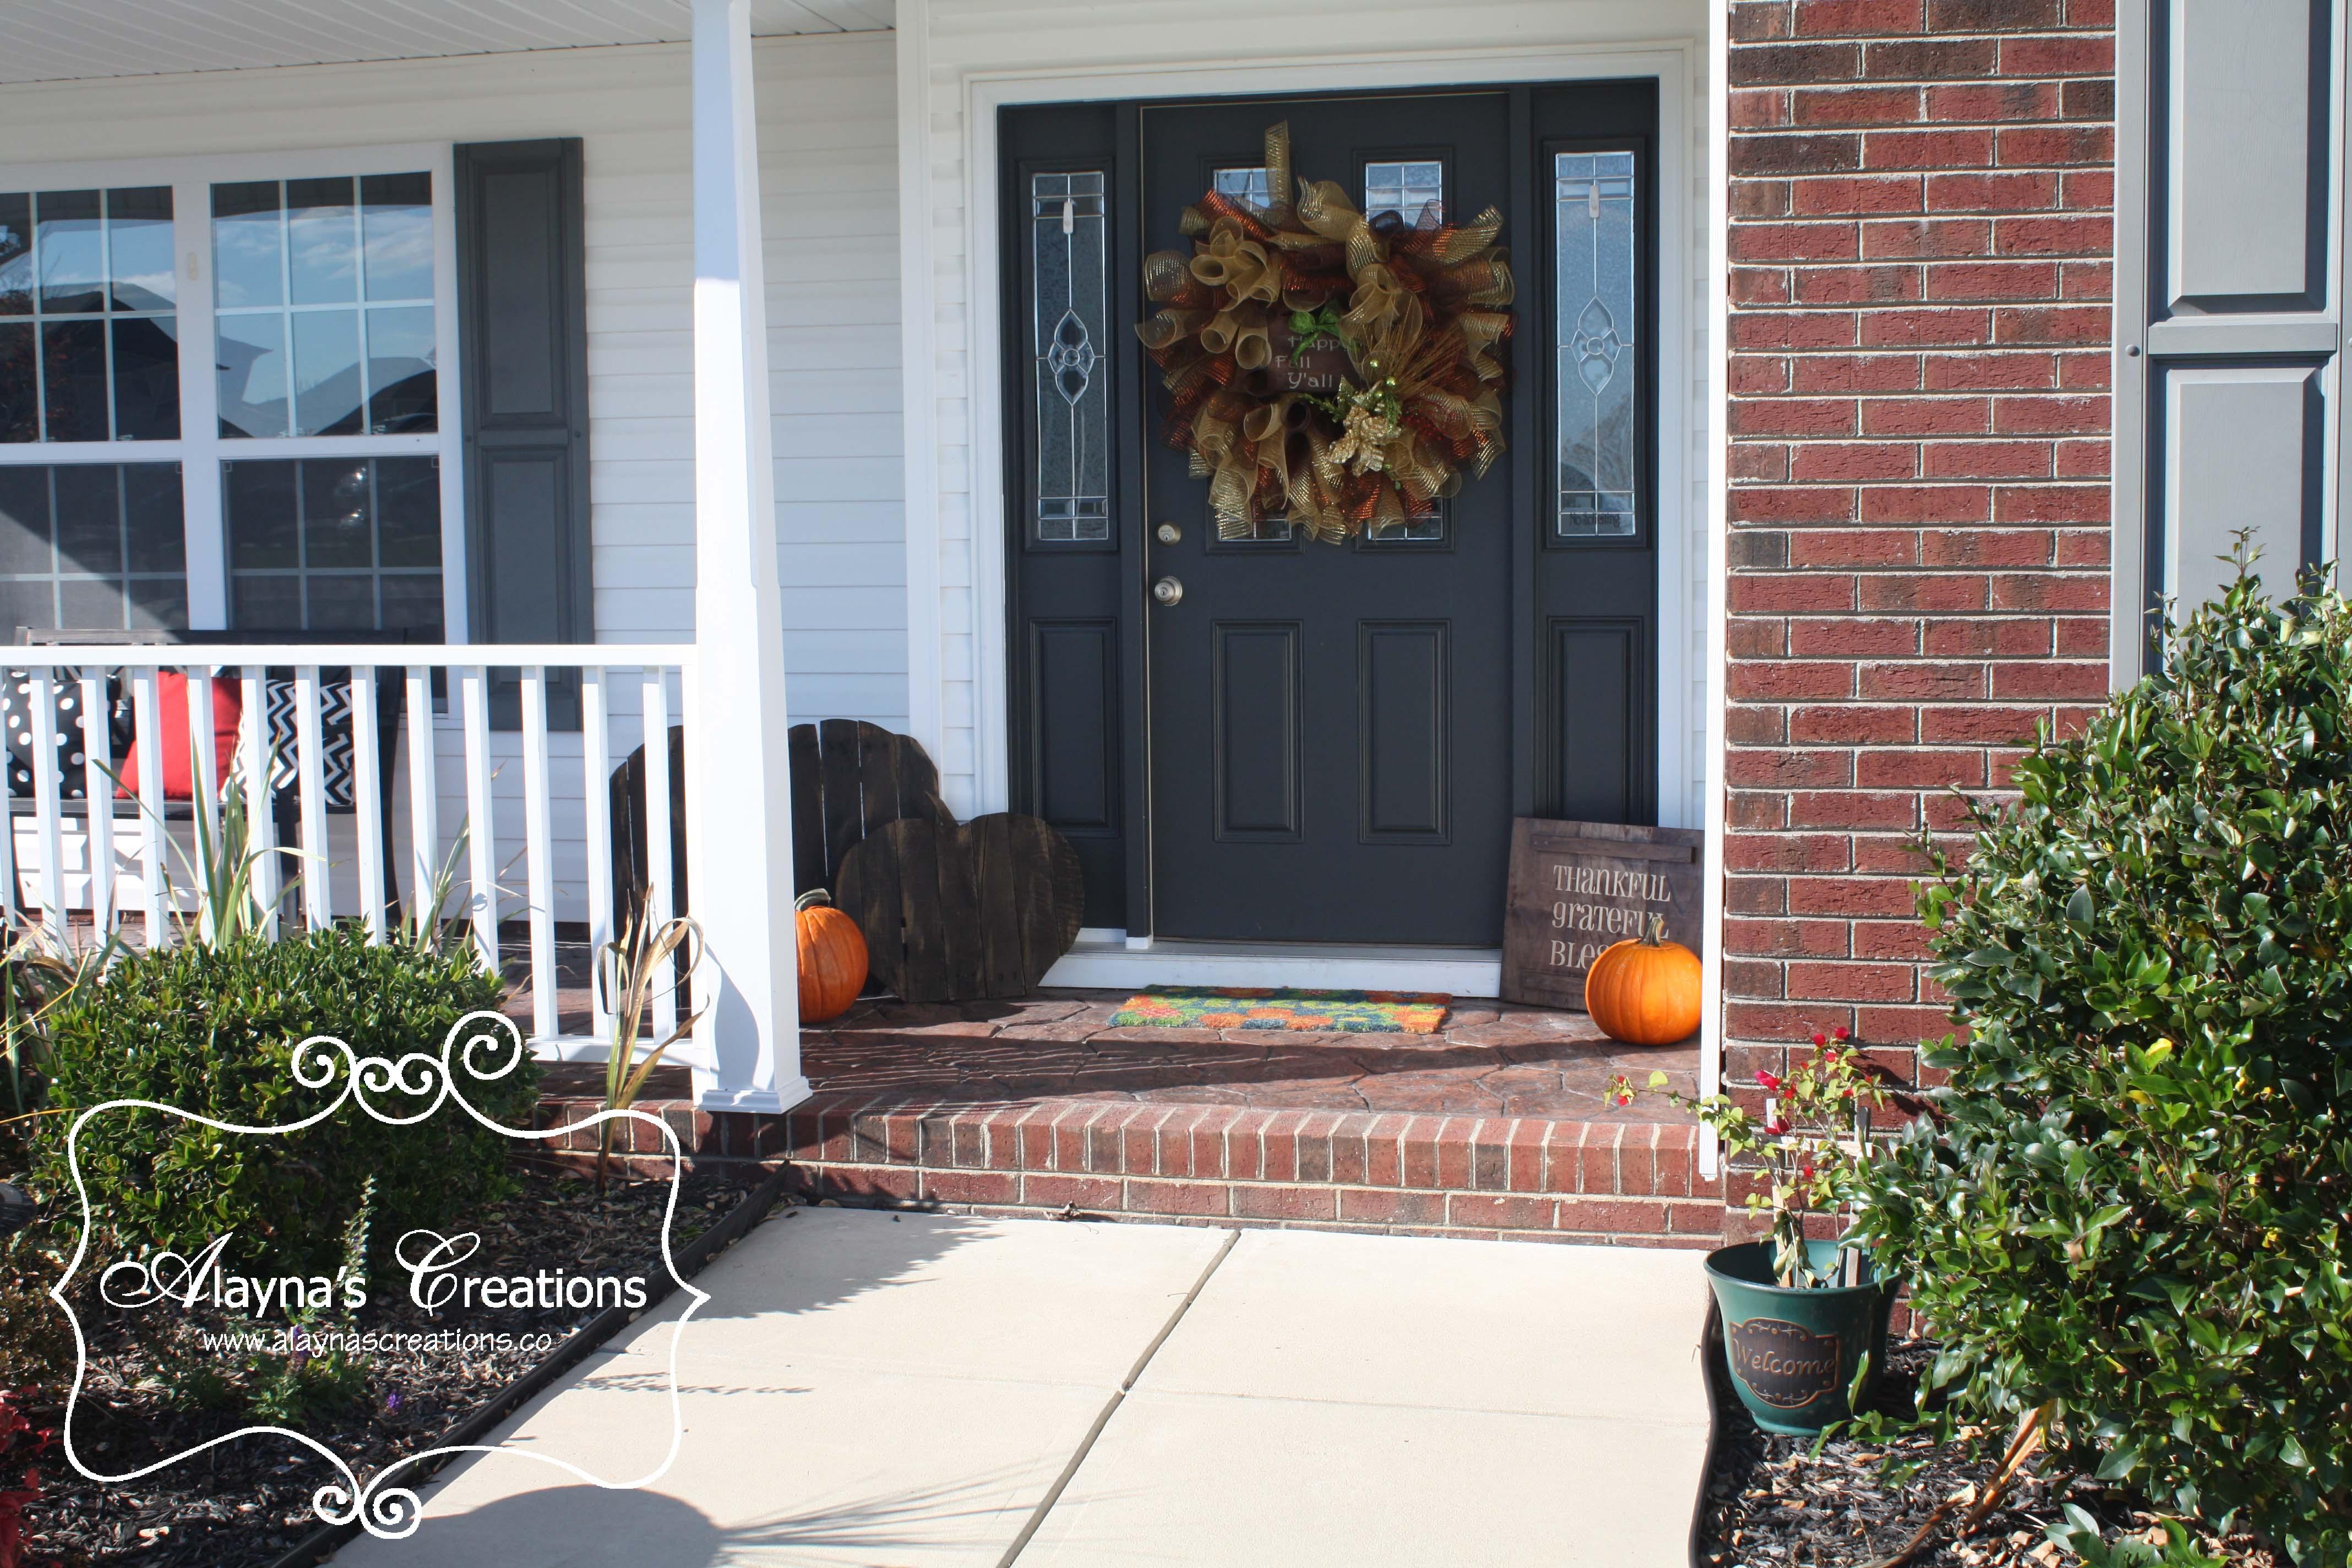 Wooden Pallet Pumpkins Diy Home Decor And Crafts